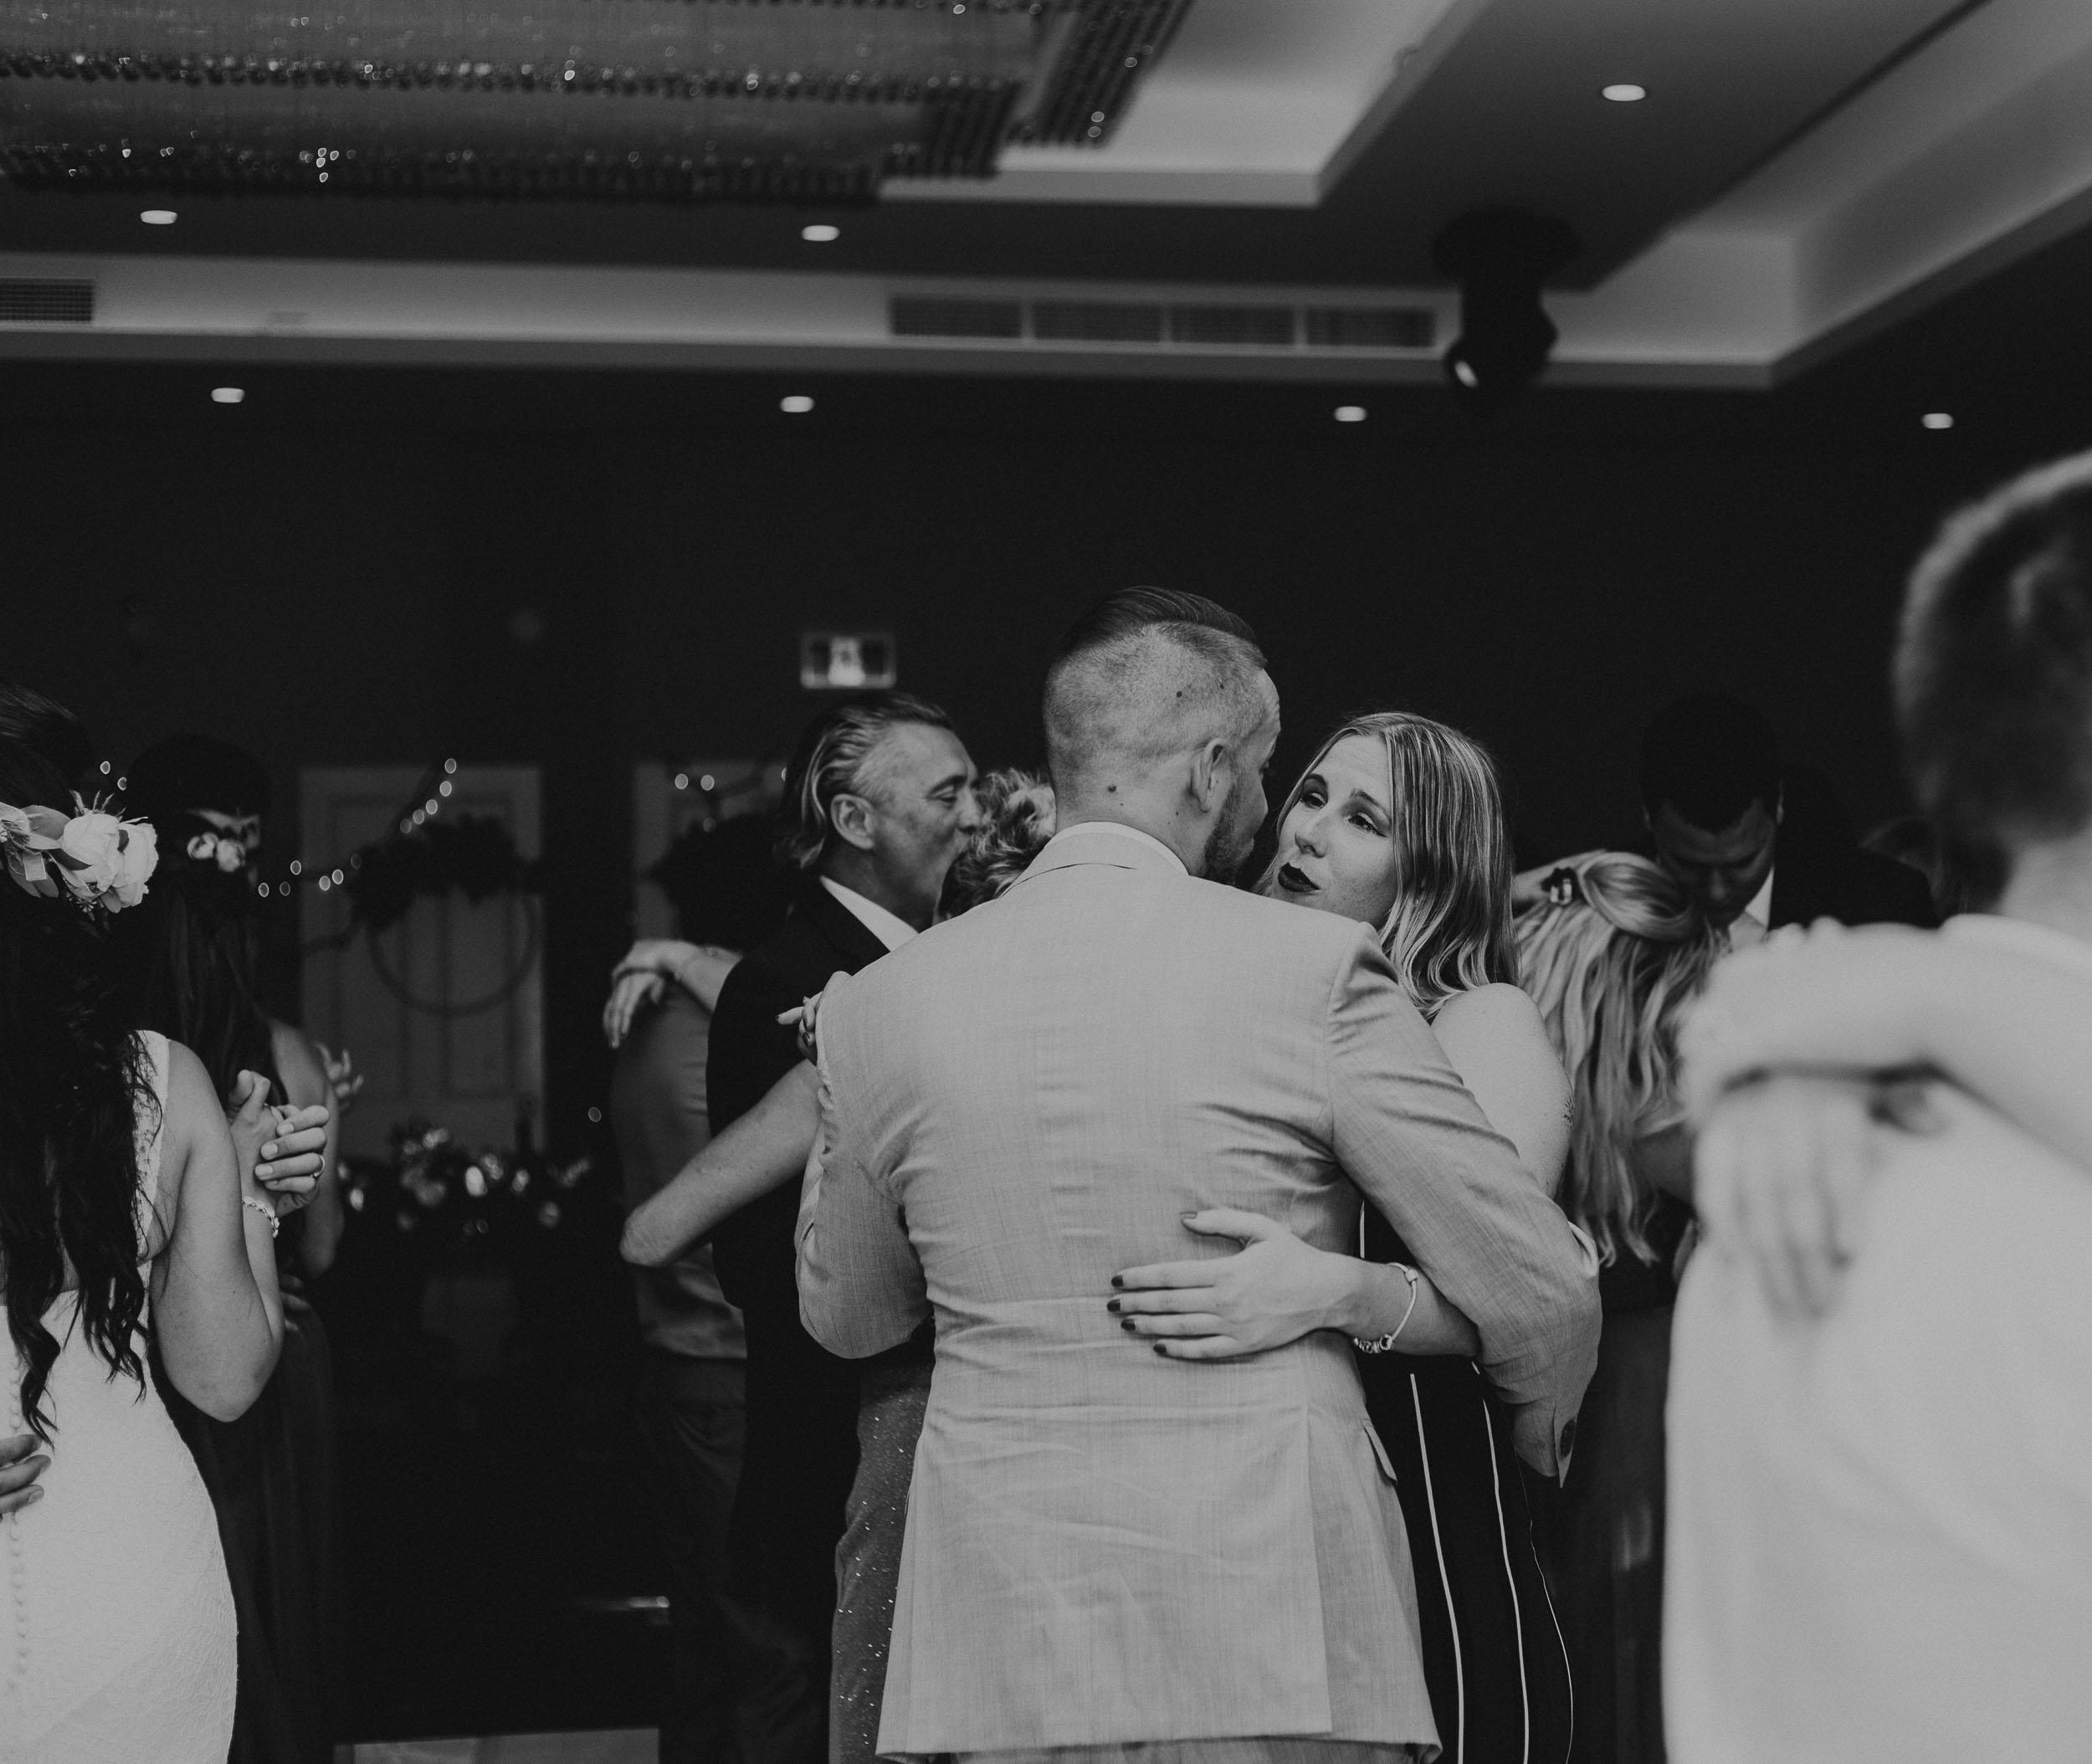 intimate-wedding-elopement-photographer-ottawa-toronto-8674.jpg